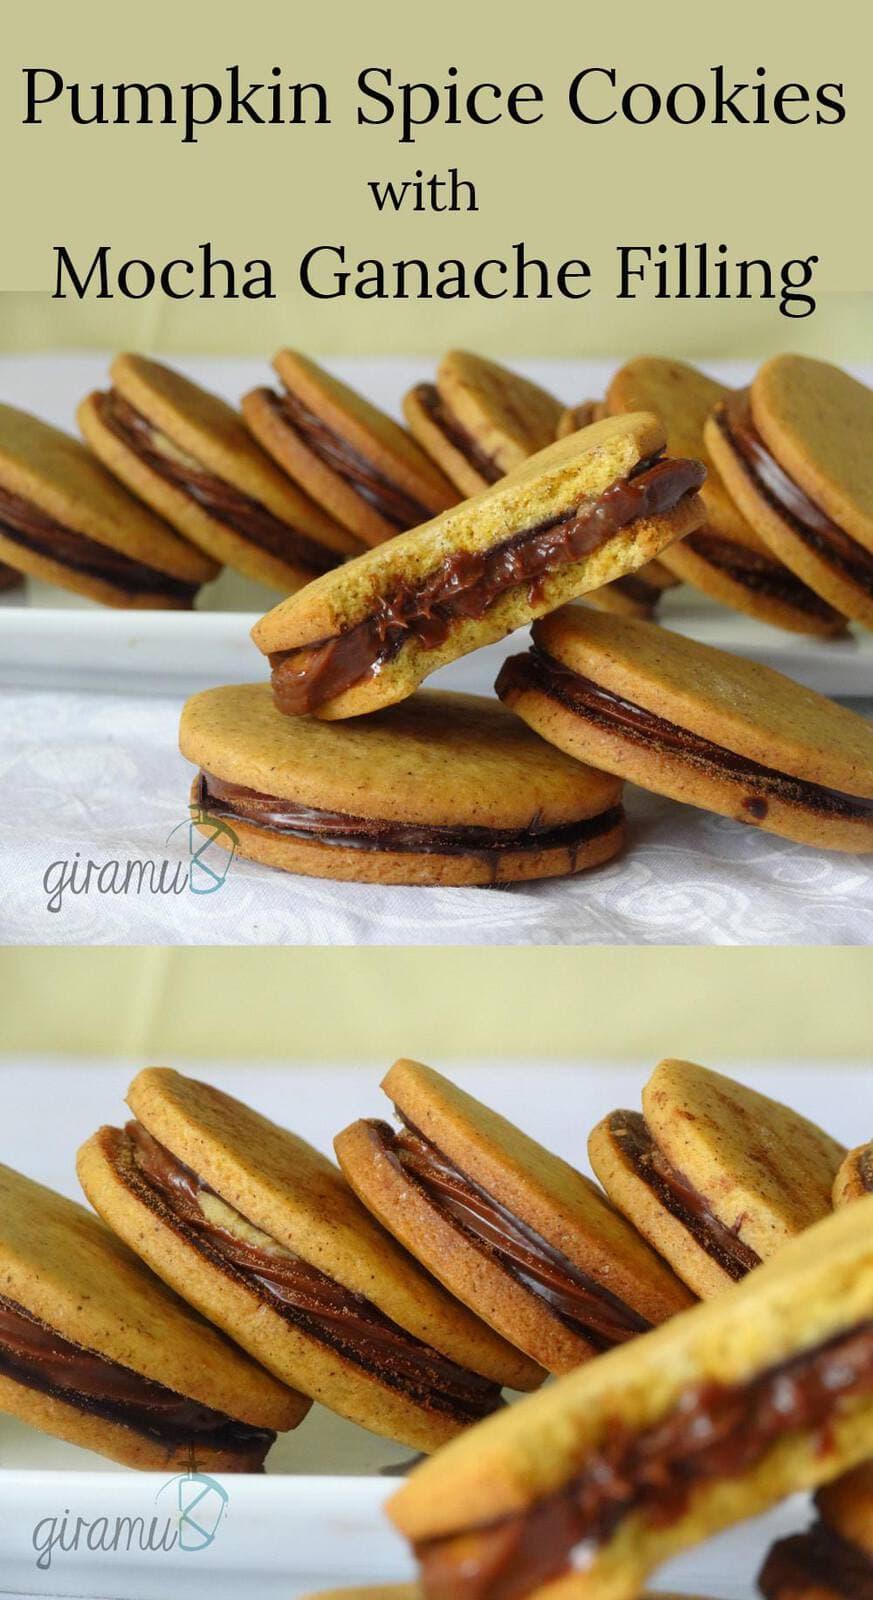 Pumpkin Spice Cookies with Mocha Ganache Filling